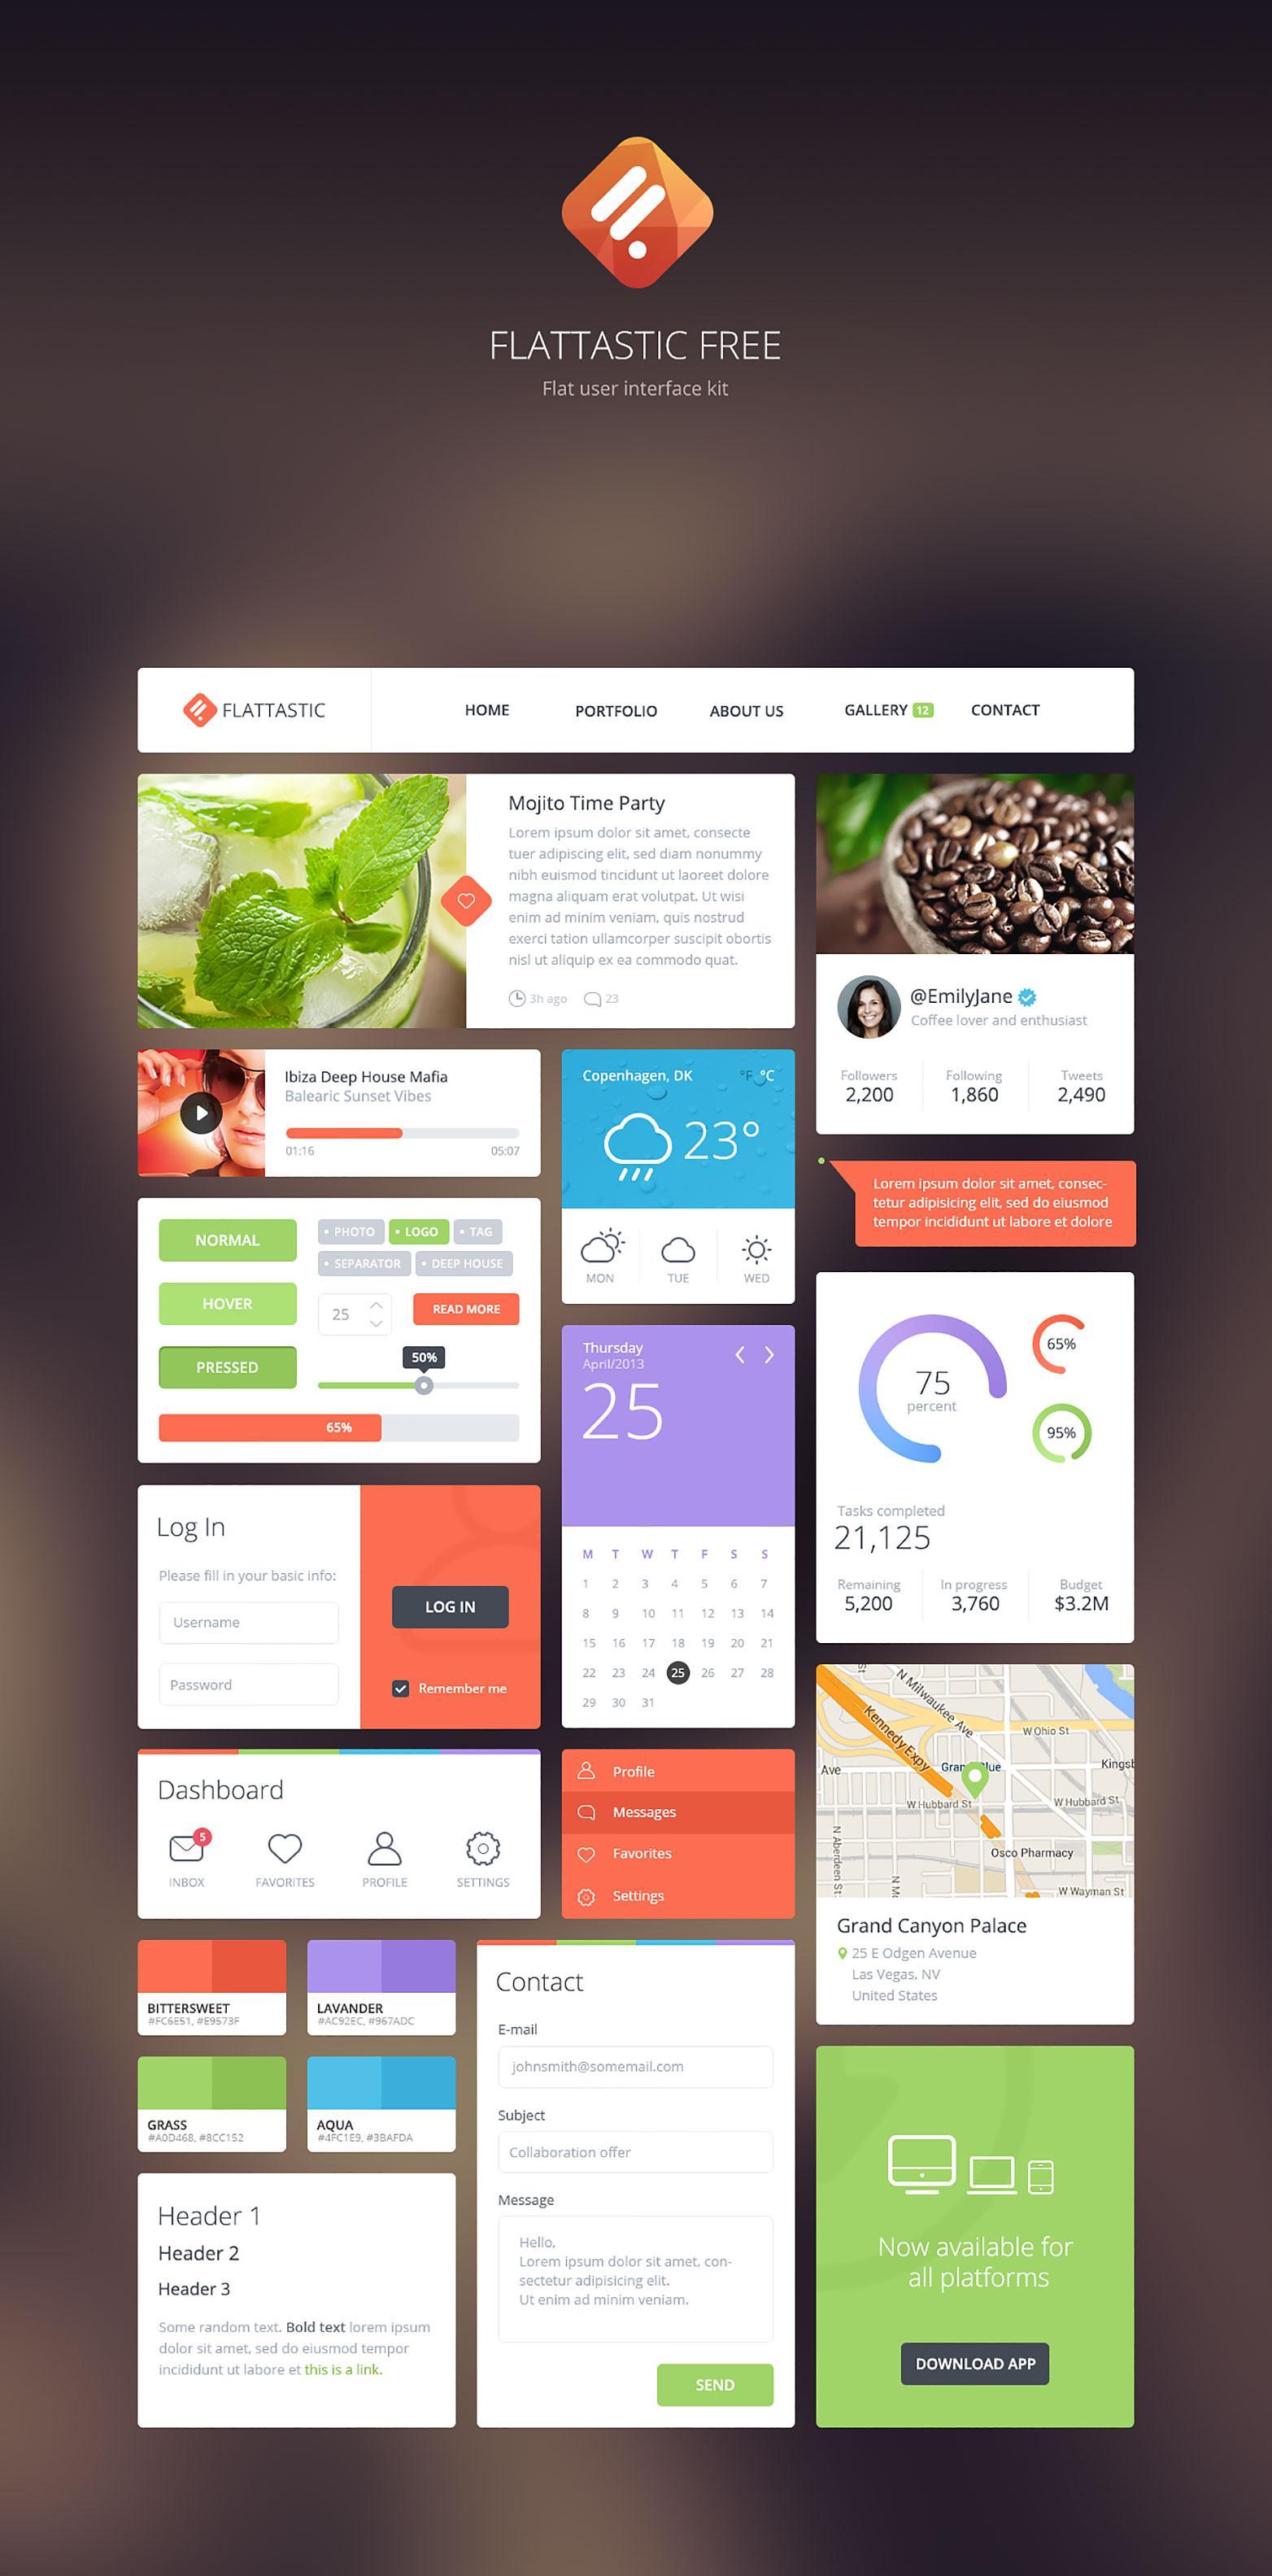 Free Download: Flattastic UI kit | Webdesigner Depot